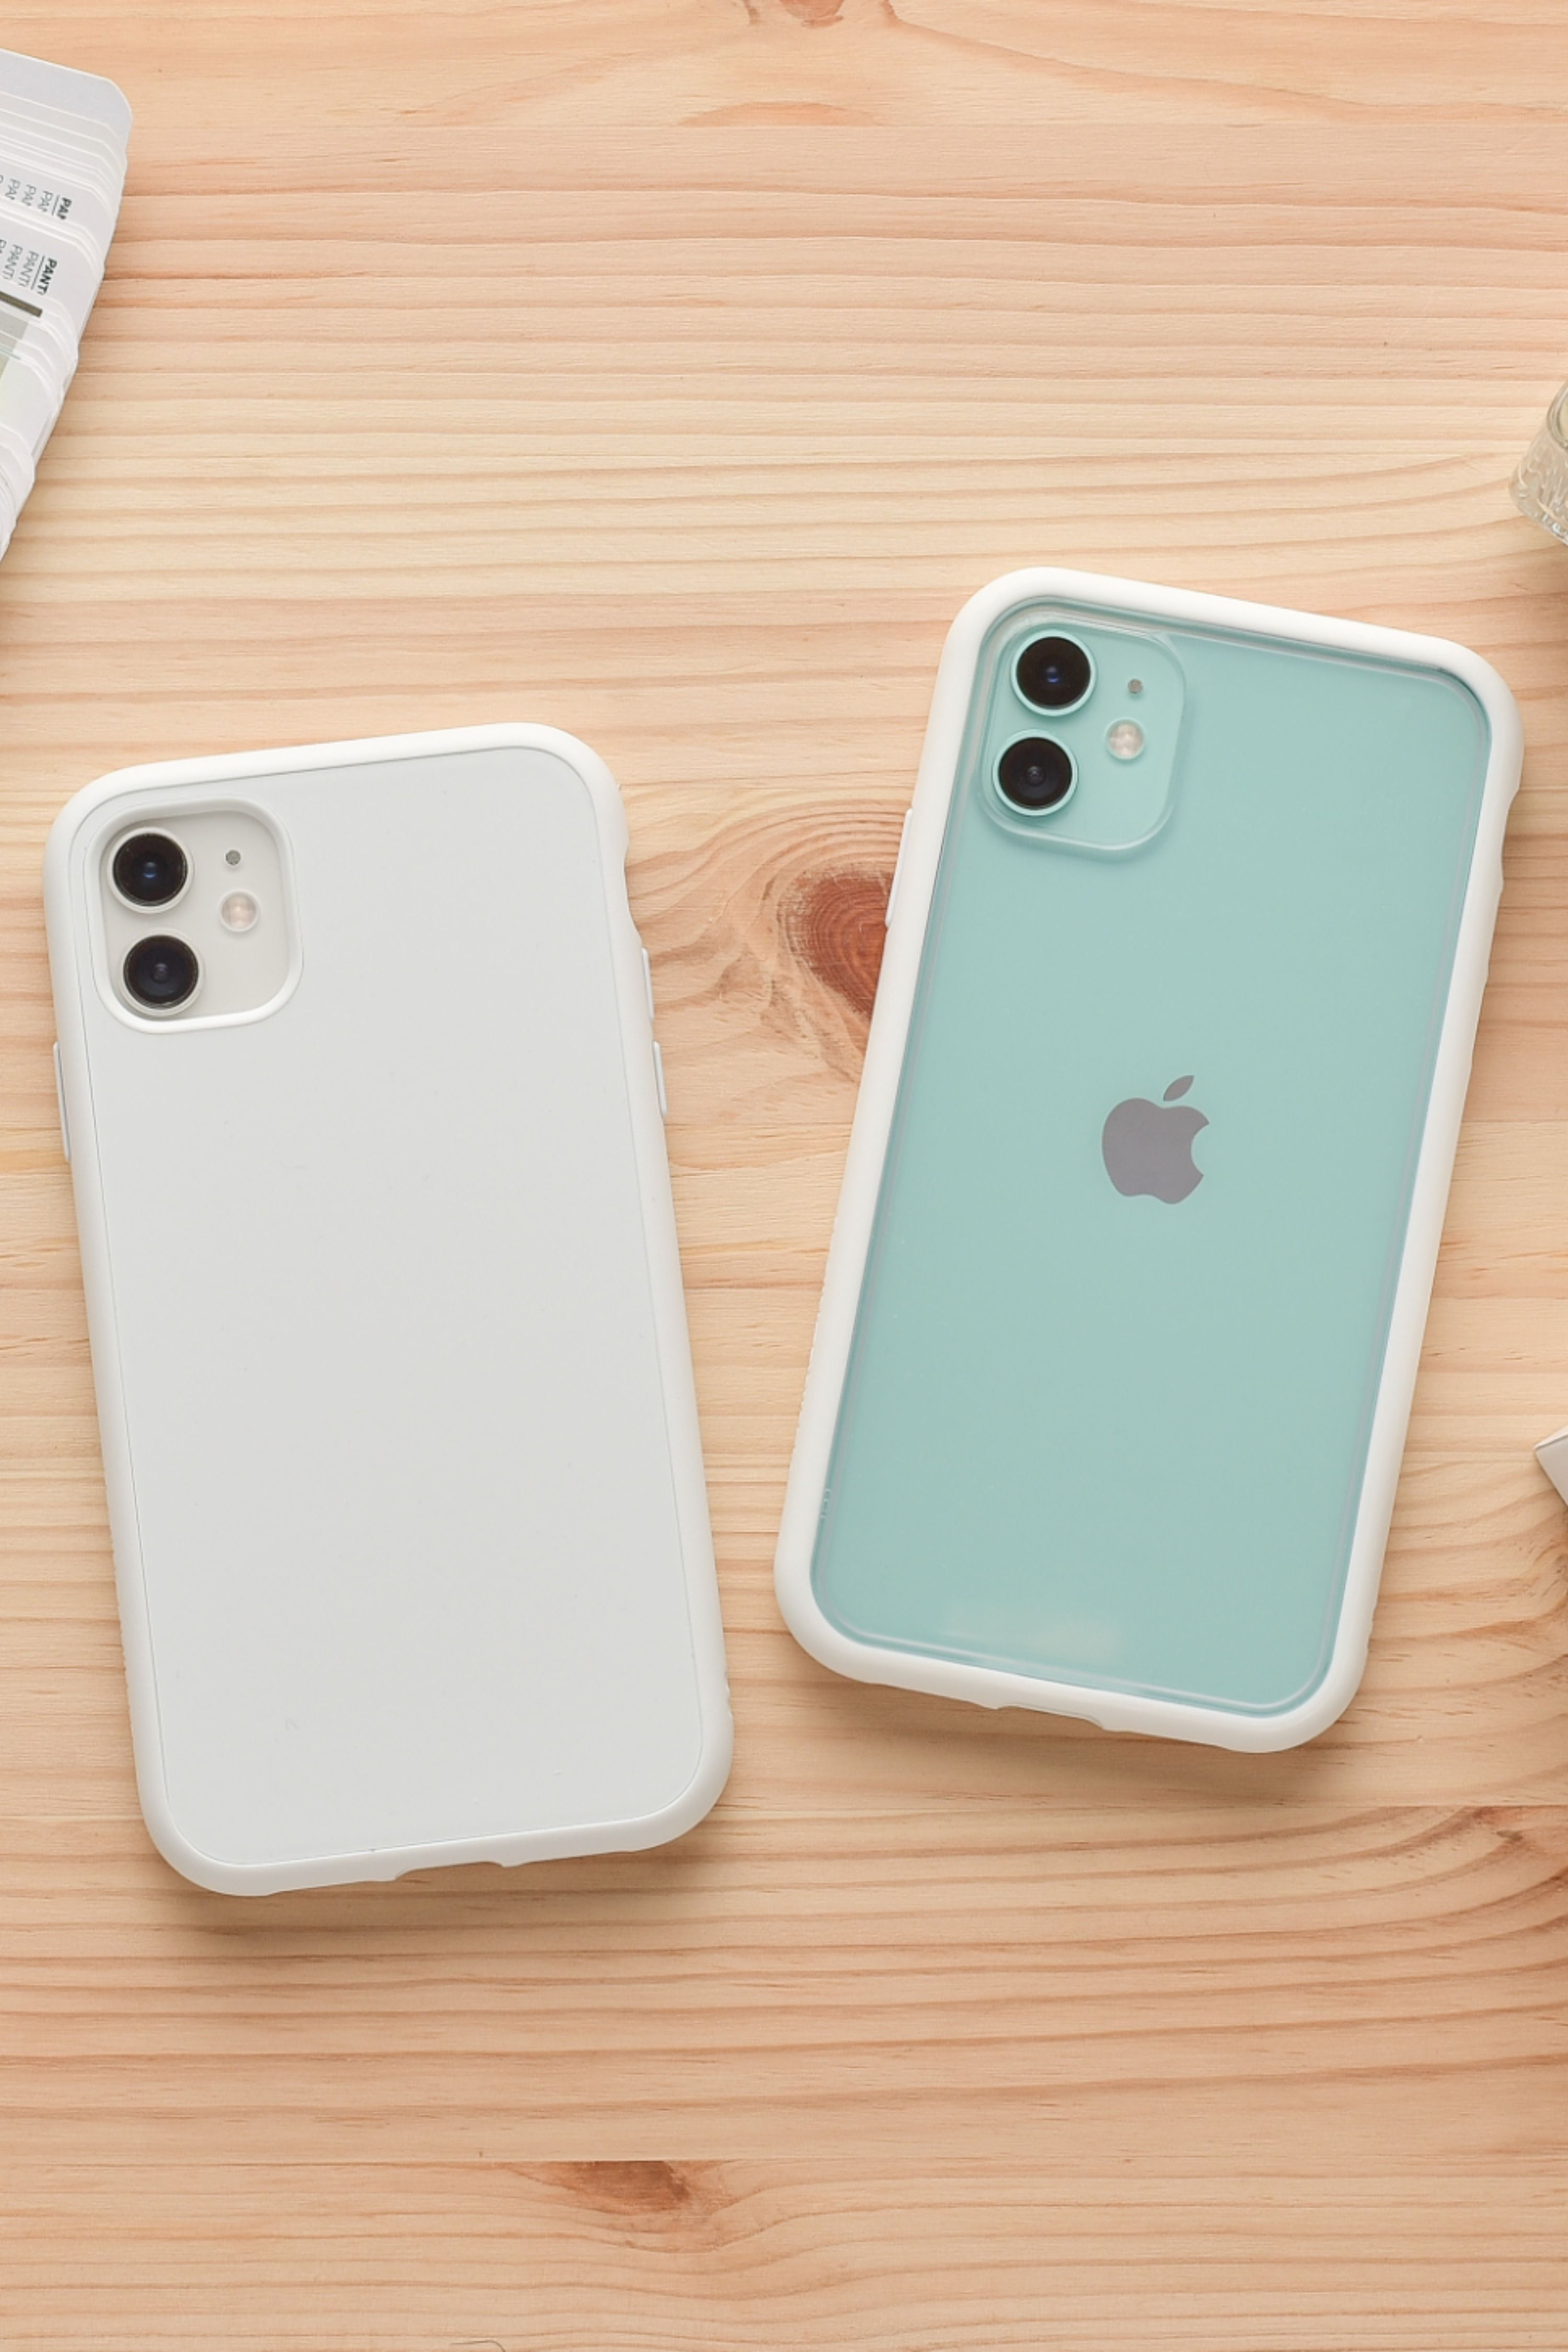 Iphone 11 white   iphone 11, iphone, apple phone